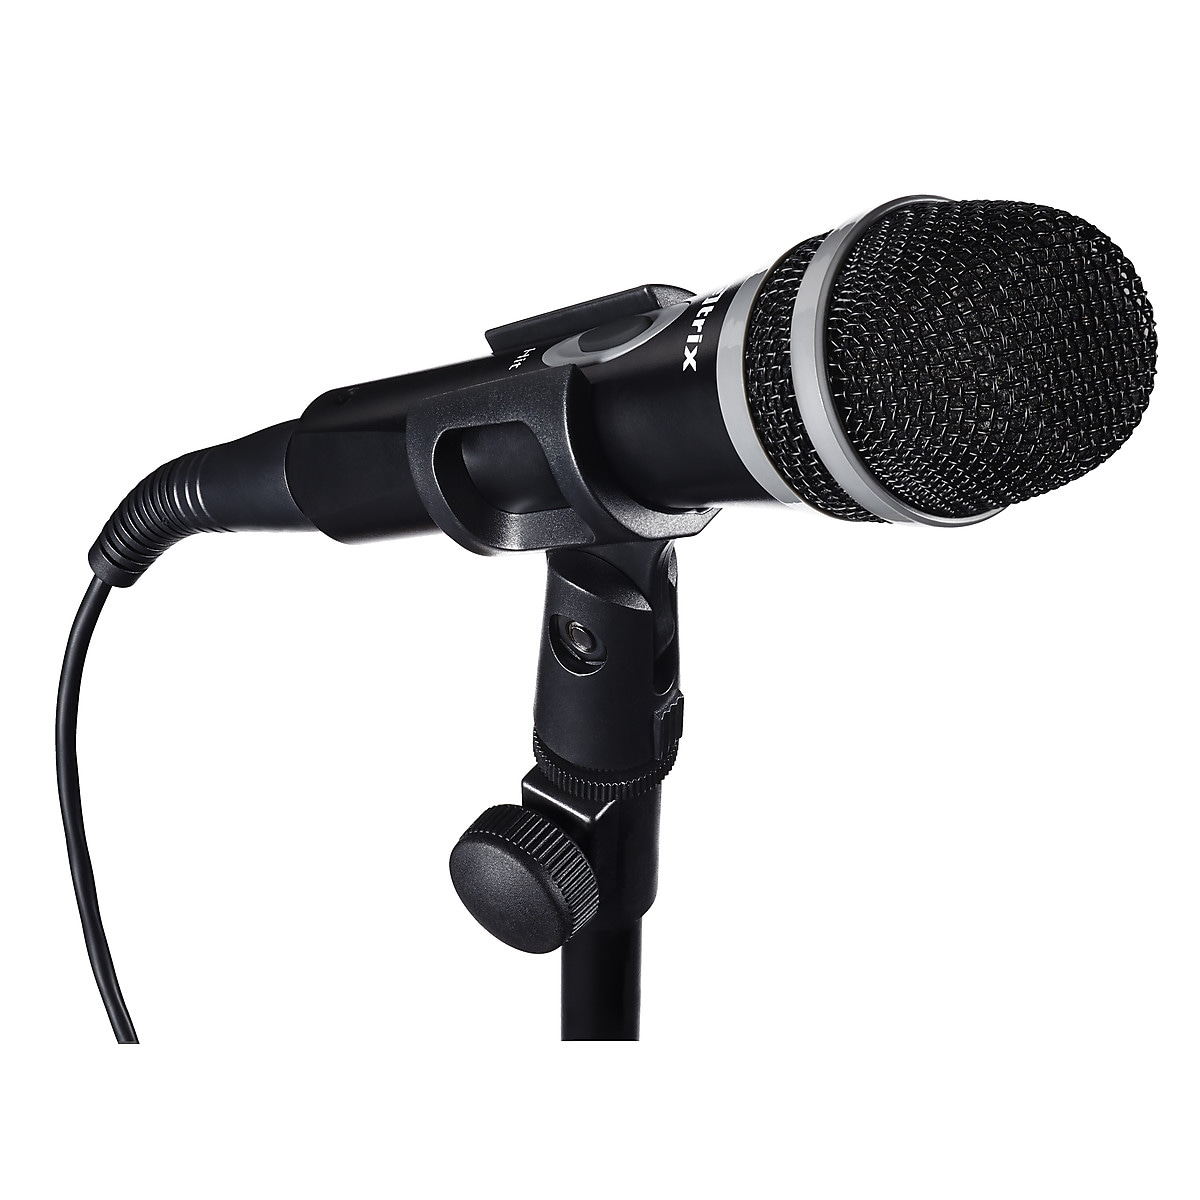 Karaokesystem Singtrix